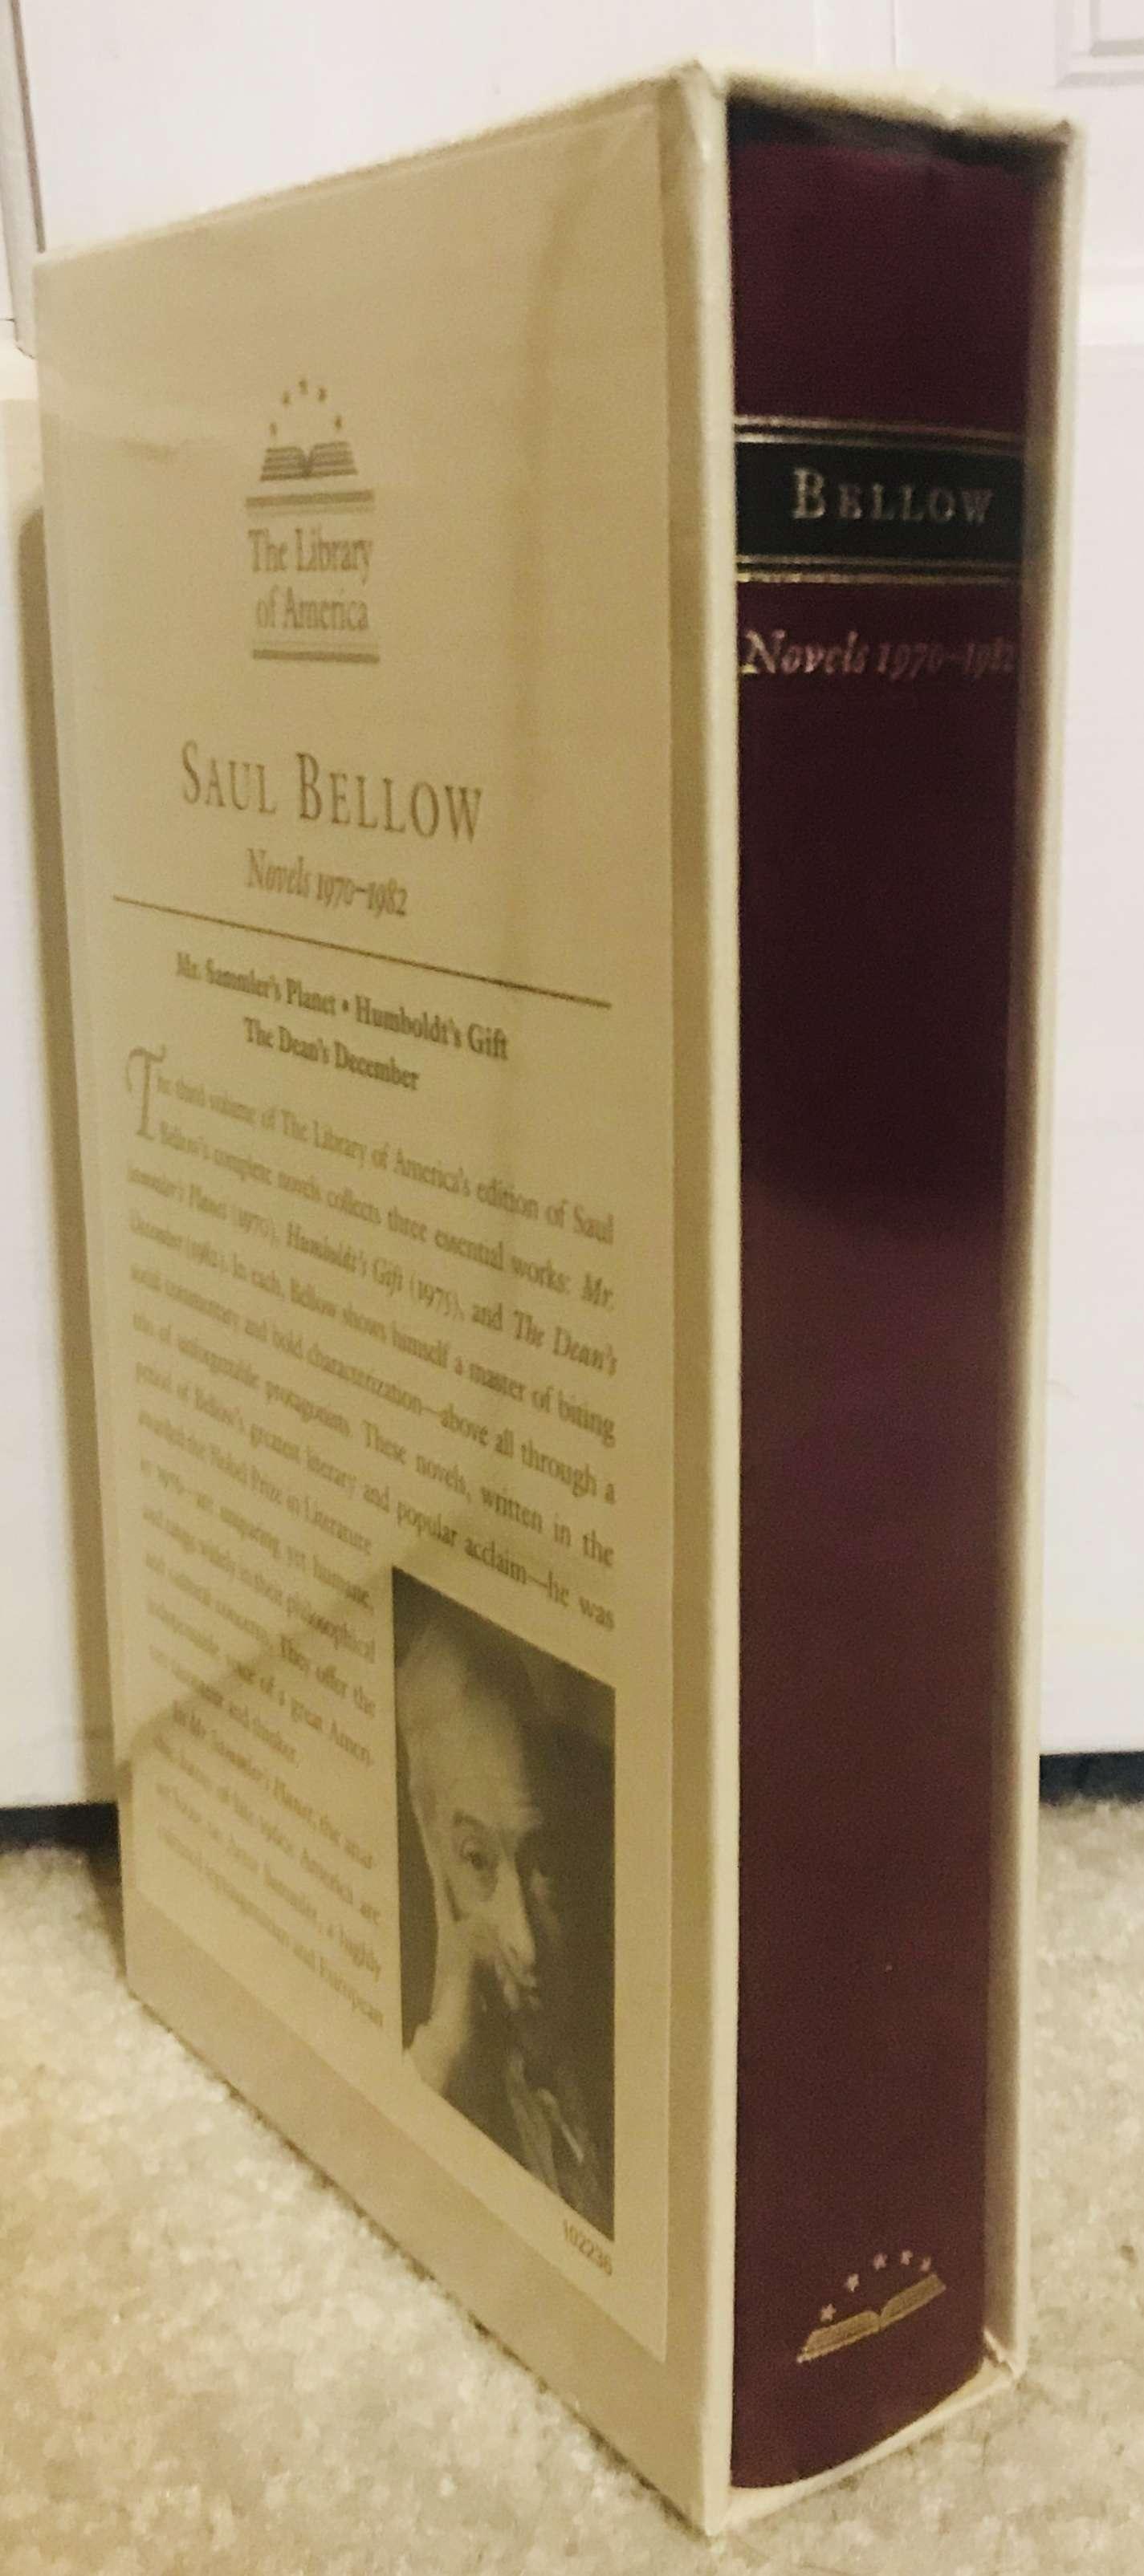 Saul Bellow: Novels 1970-1982 (LOA #209): Mr. Sammler's Planet / Humboldt's Gift / The Dean's December (Library of America Saul Bellow Edition), Bellow, Saul